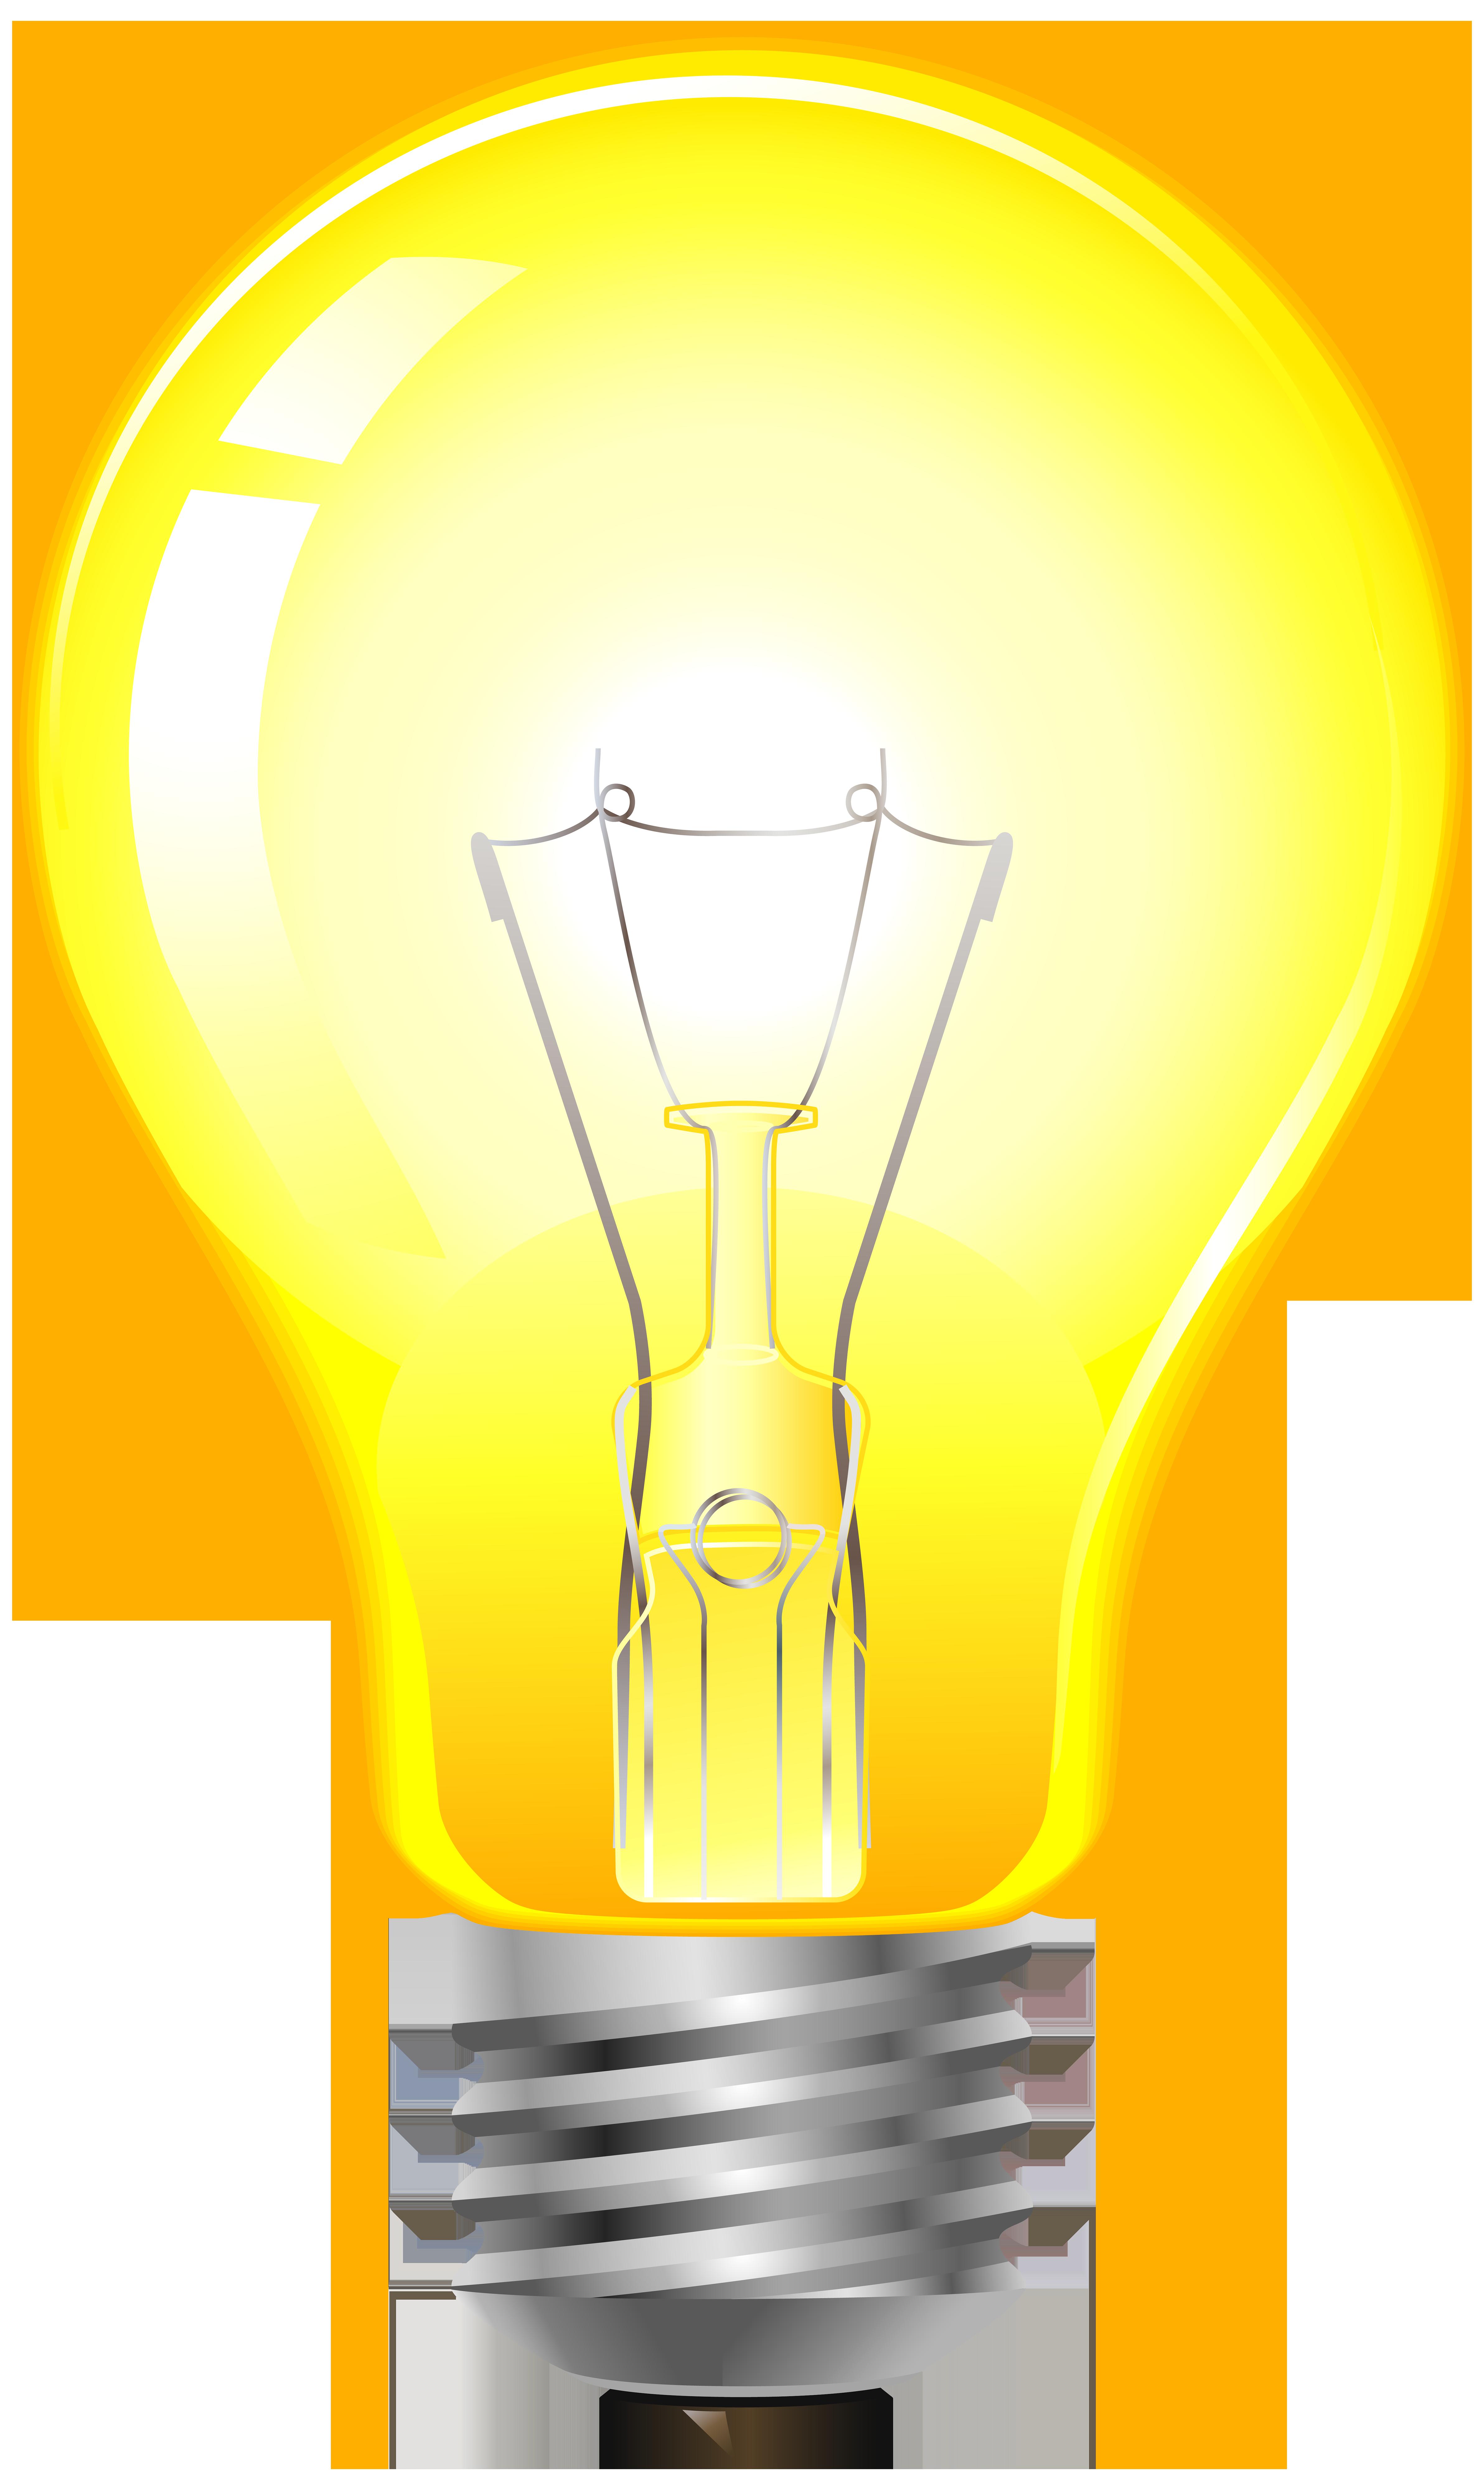 Light bulb clip art realistic. Yellow png best web